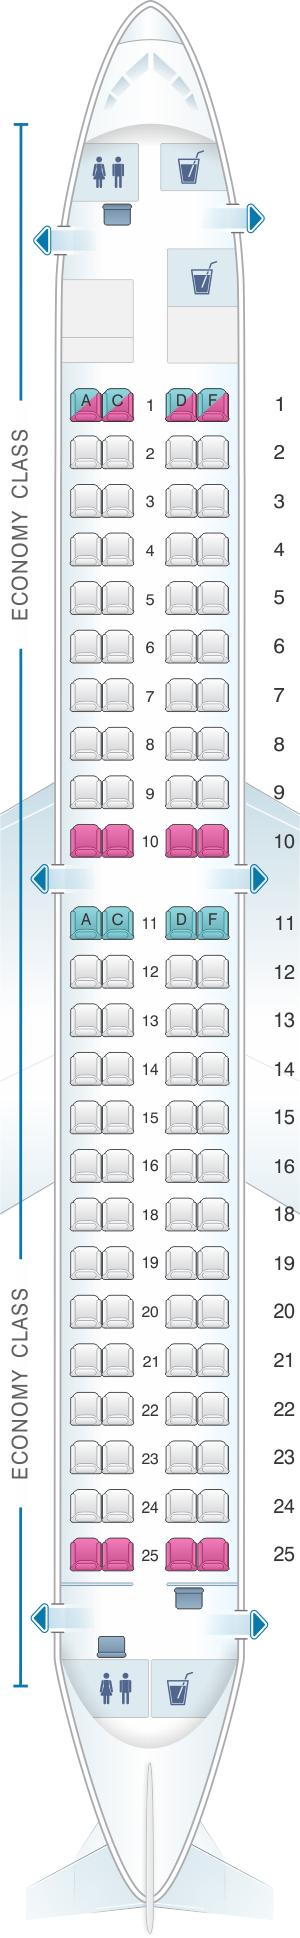 Seat Map Finnair Embraer Emb 190 Seatmaestro Com